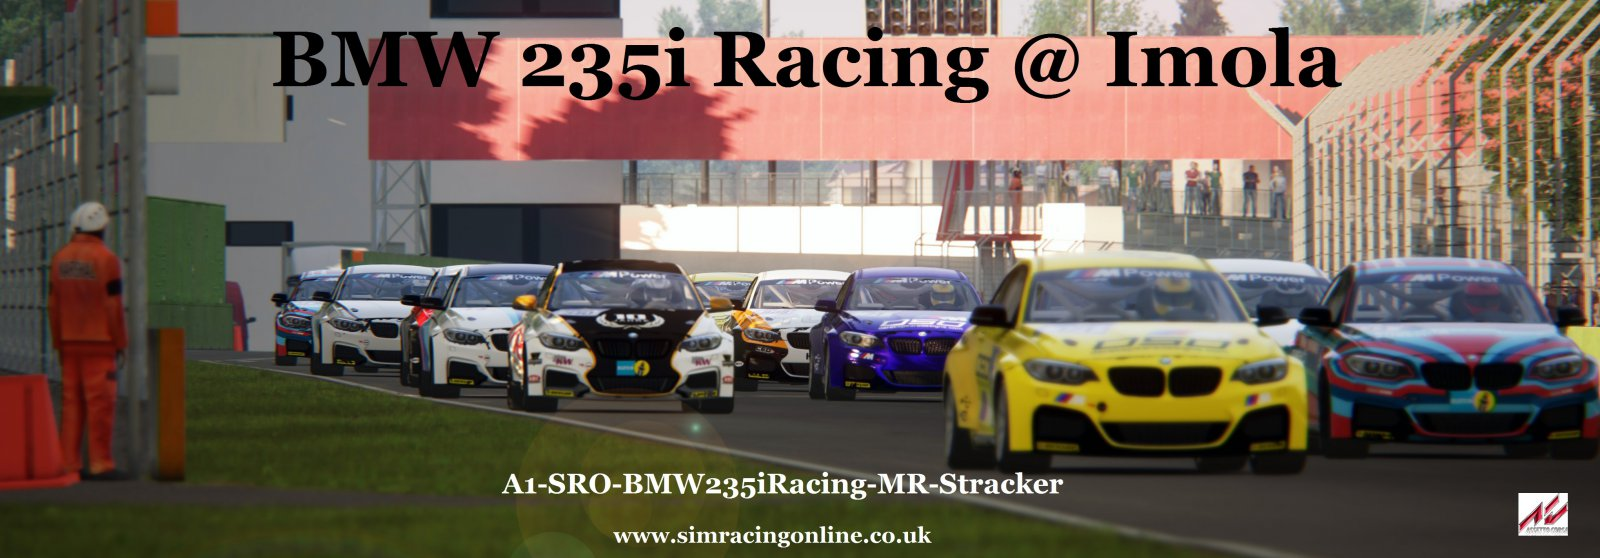 Screenshot_ks_bmw_m235i_racing_imola_27-9-117-11-15-11.jpg